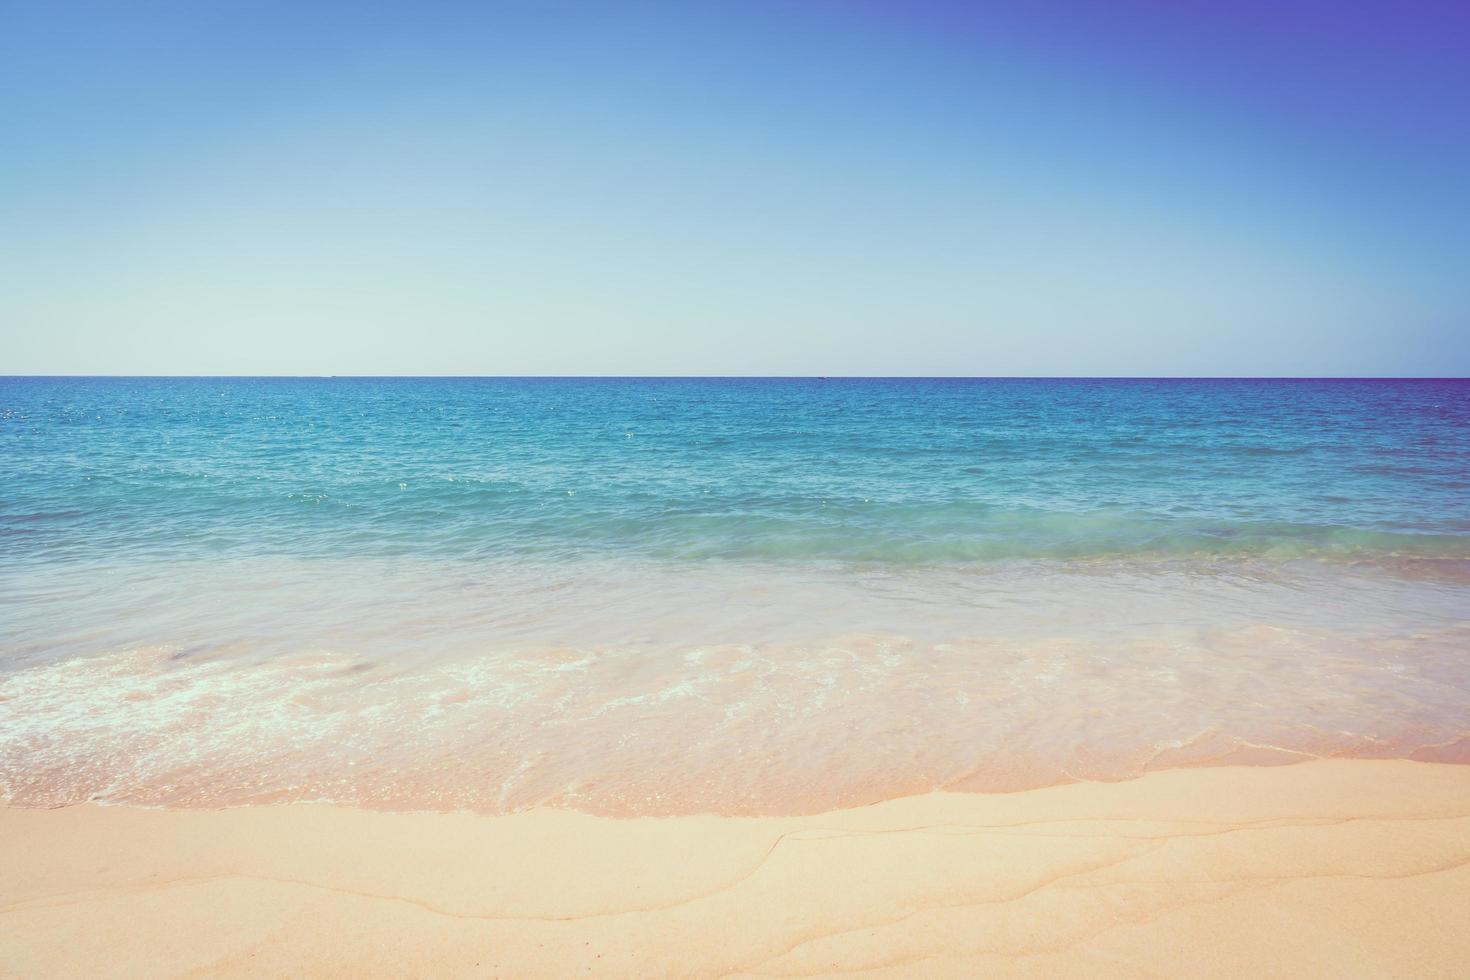 Beautiful sandy beach and sea photo